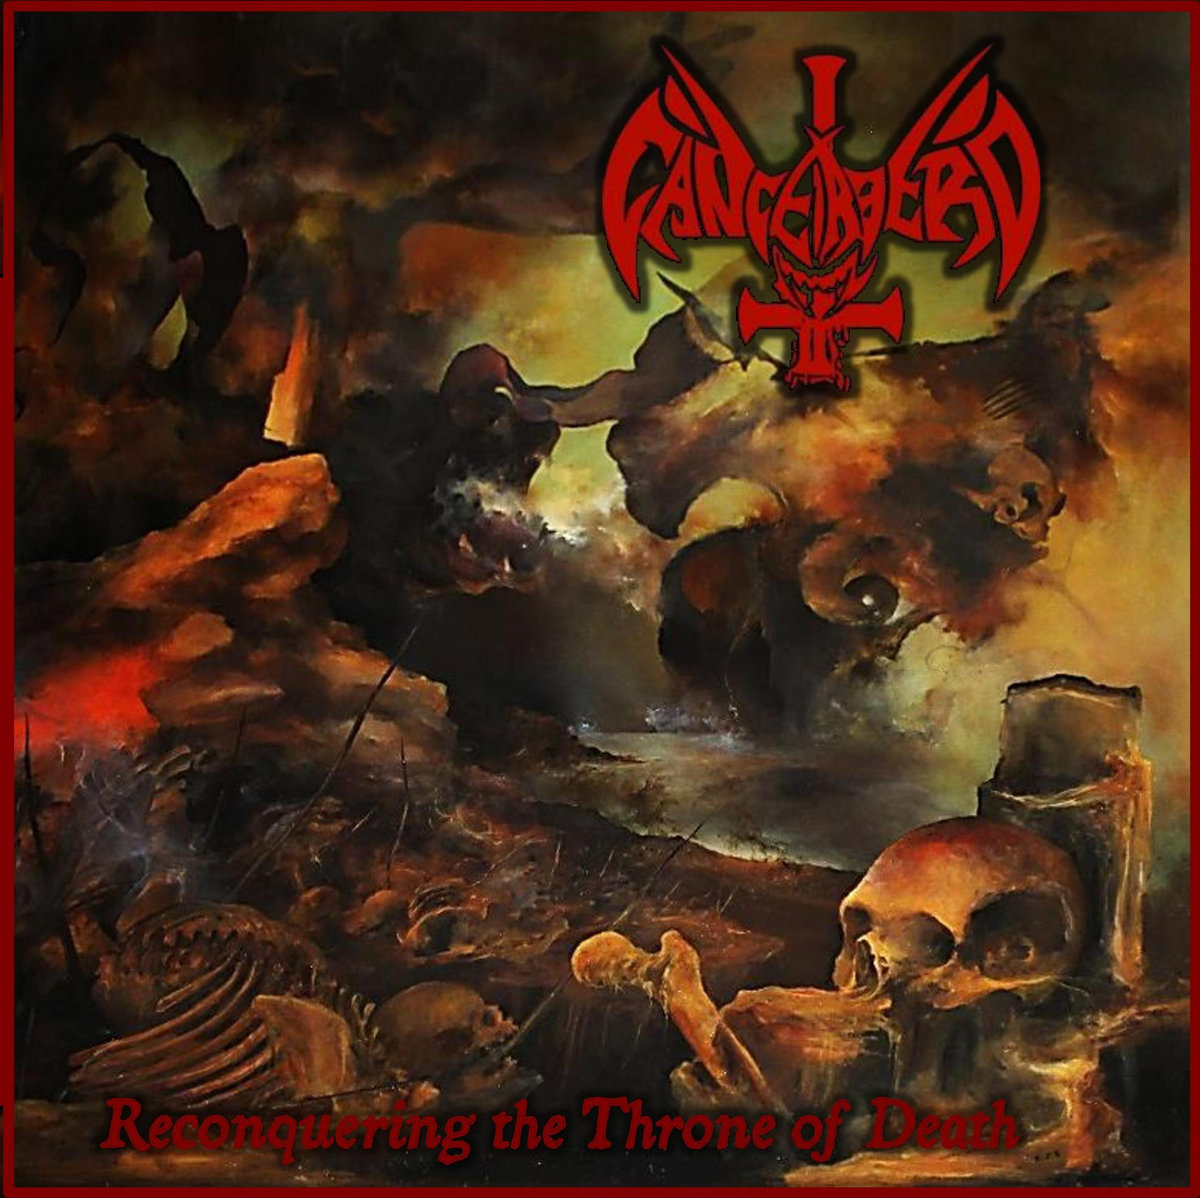 cancerbero – reconquering the throne of death